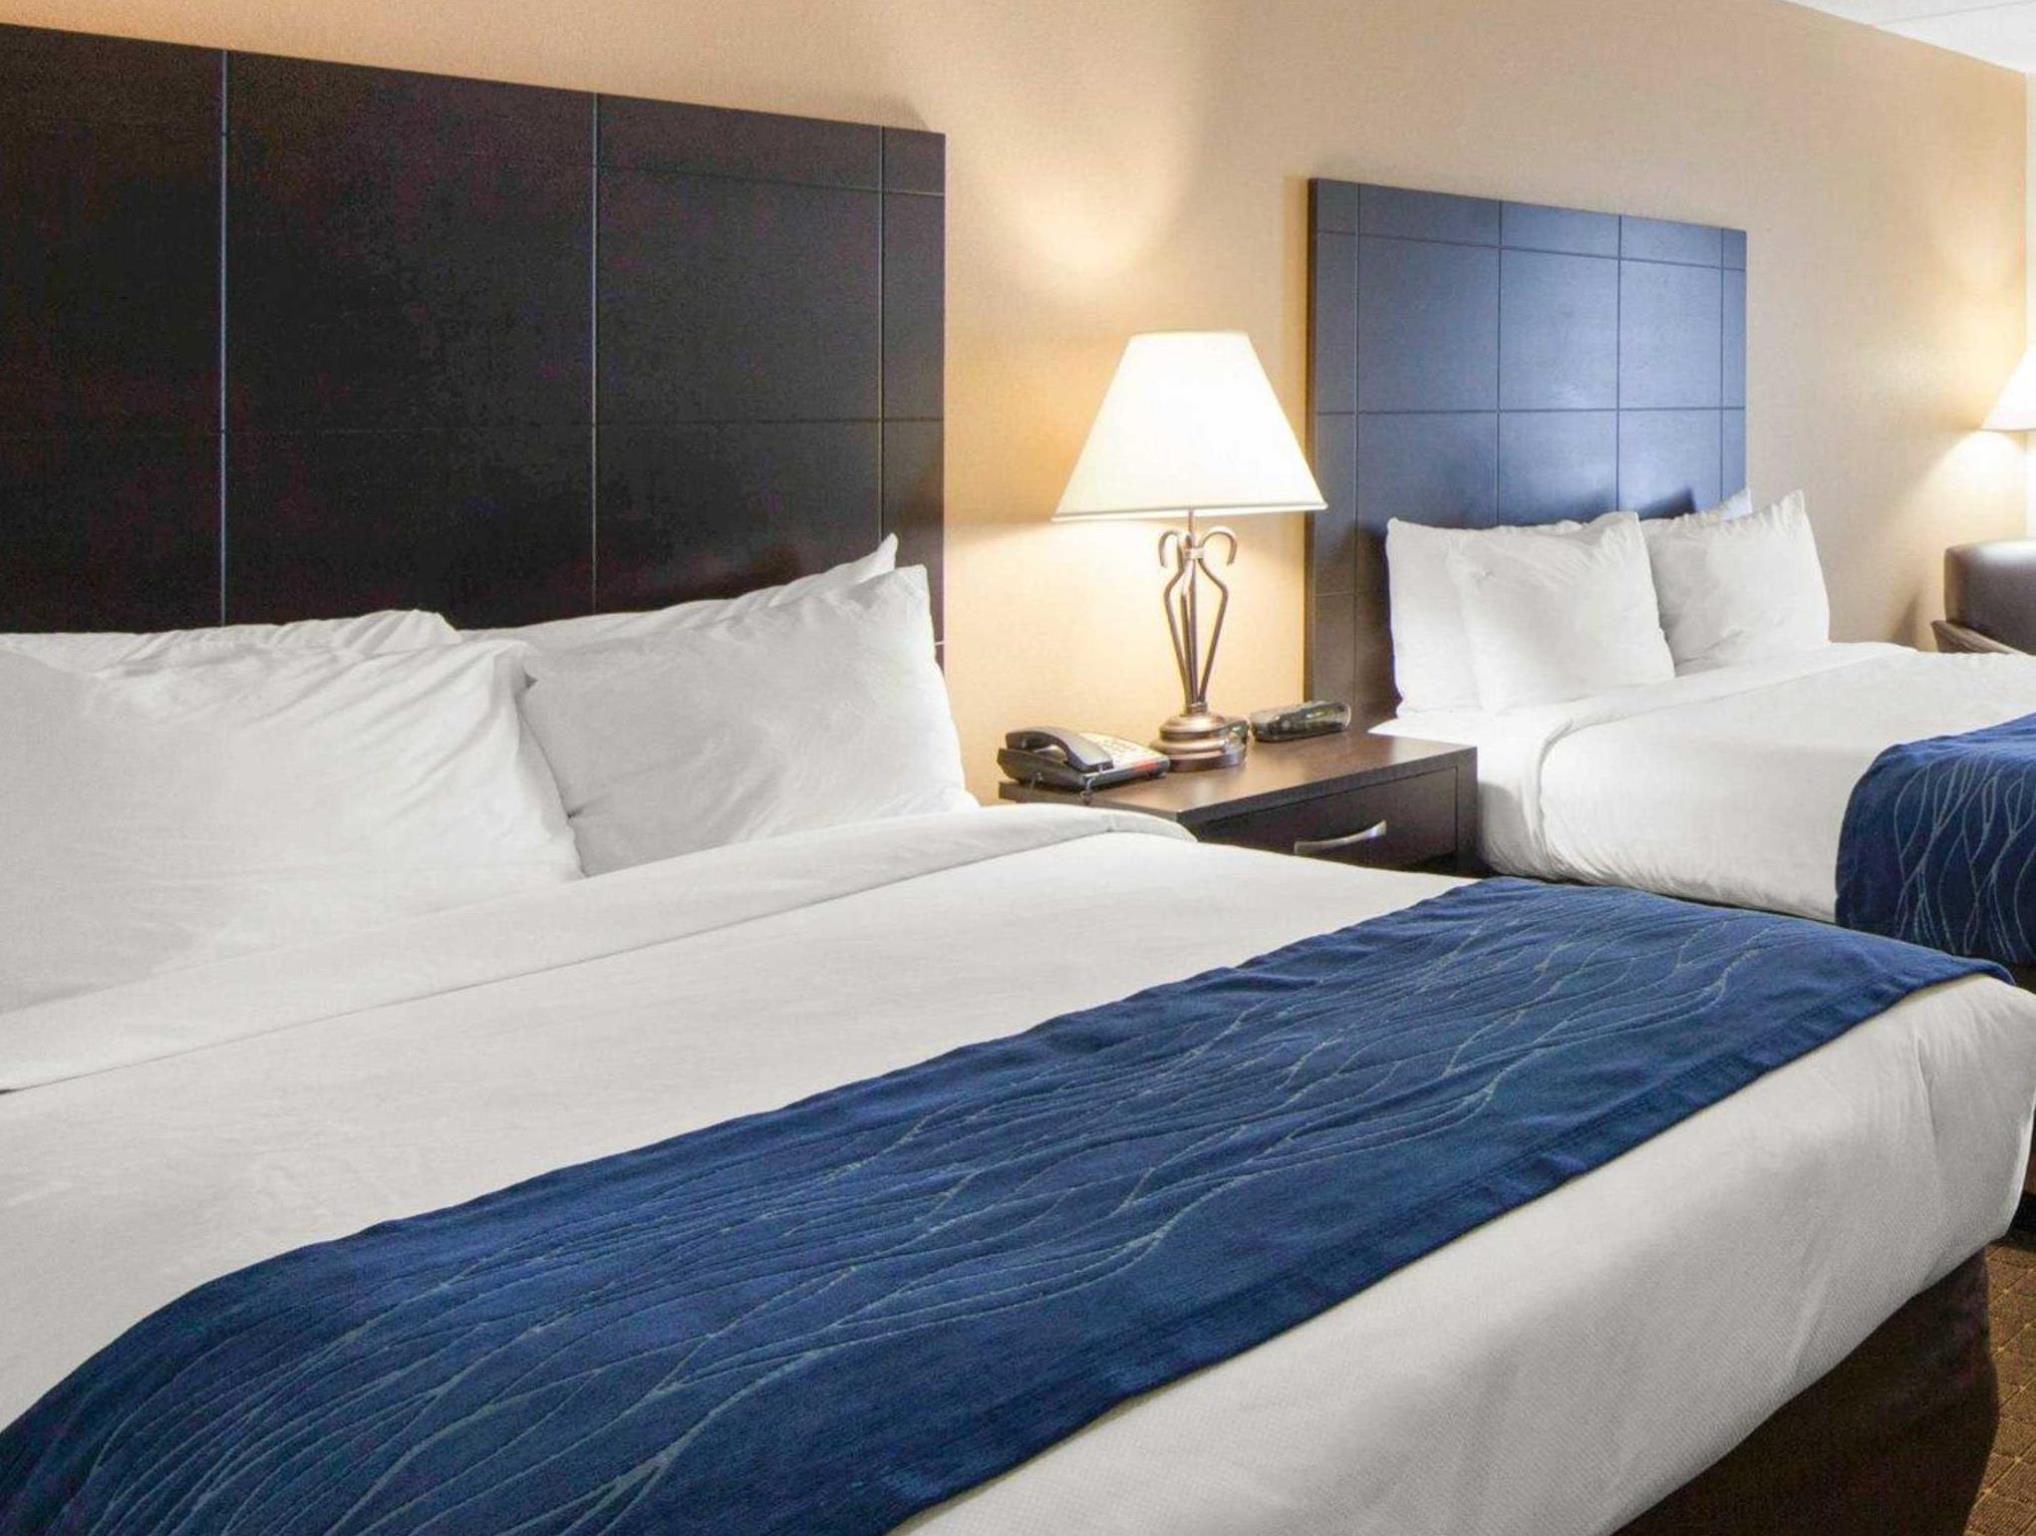 Comfort Inn Oak Ridge - Knoxville Reviews